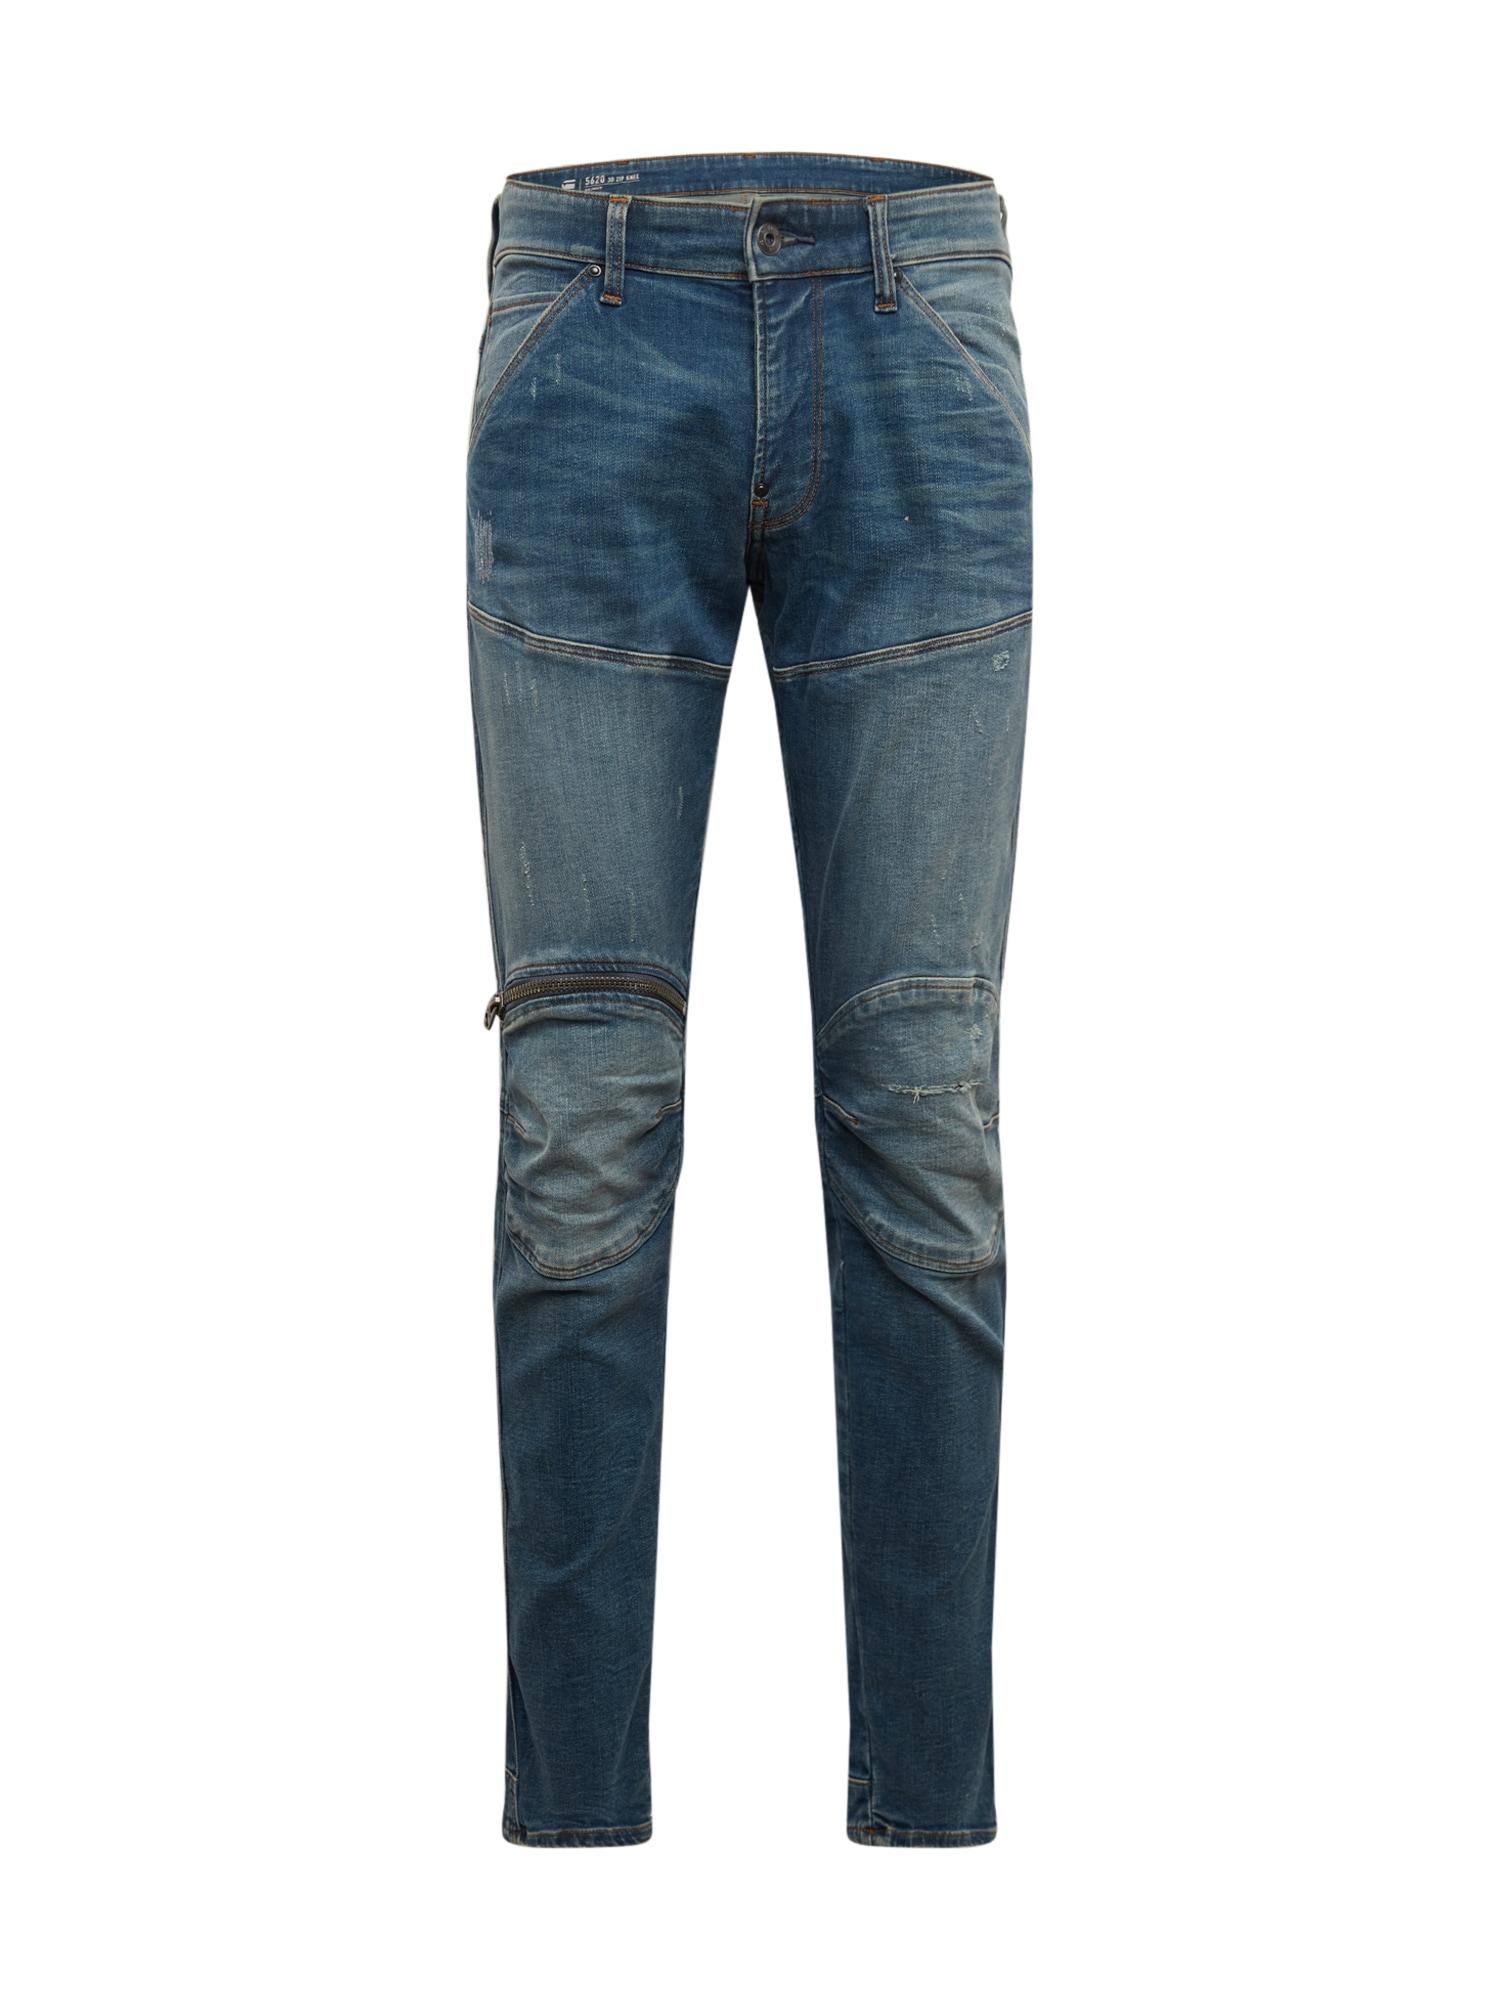 G-Star RAW Džinsai '5620 3D Zip Knee Super Slim' tamsiai (džinso) mėlyna